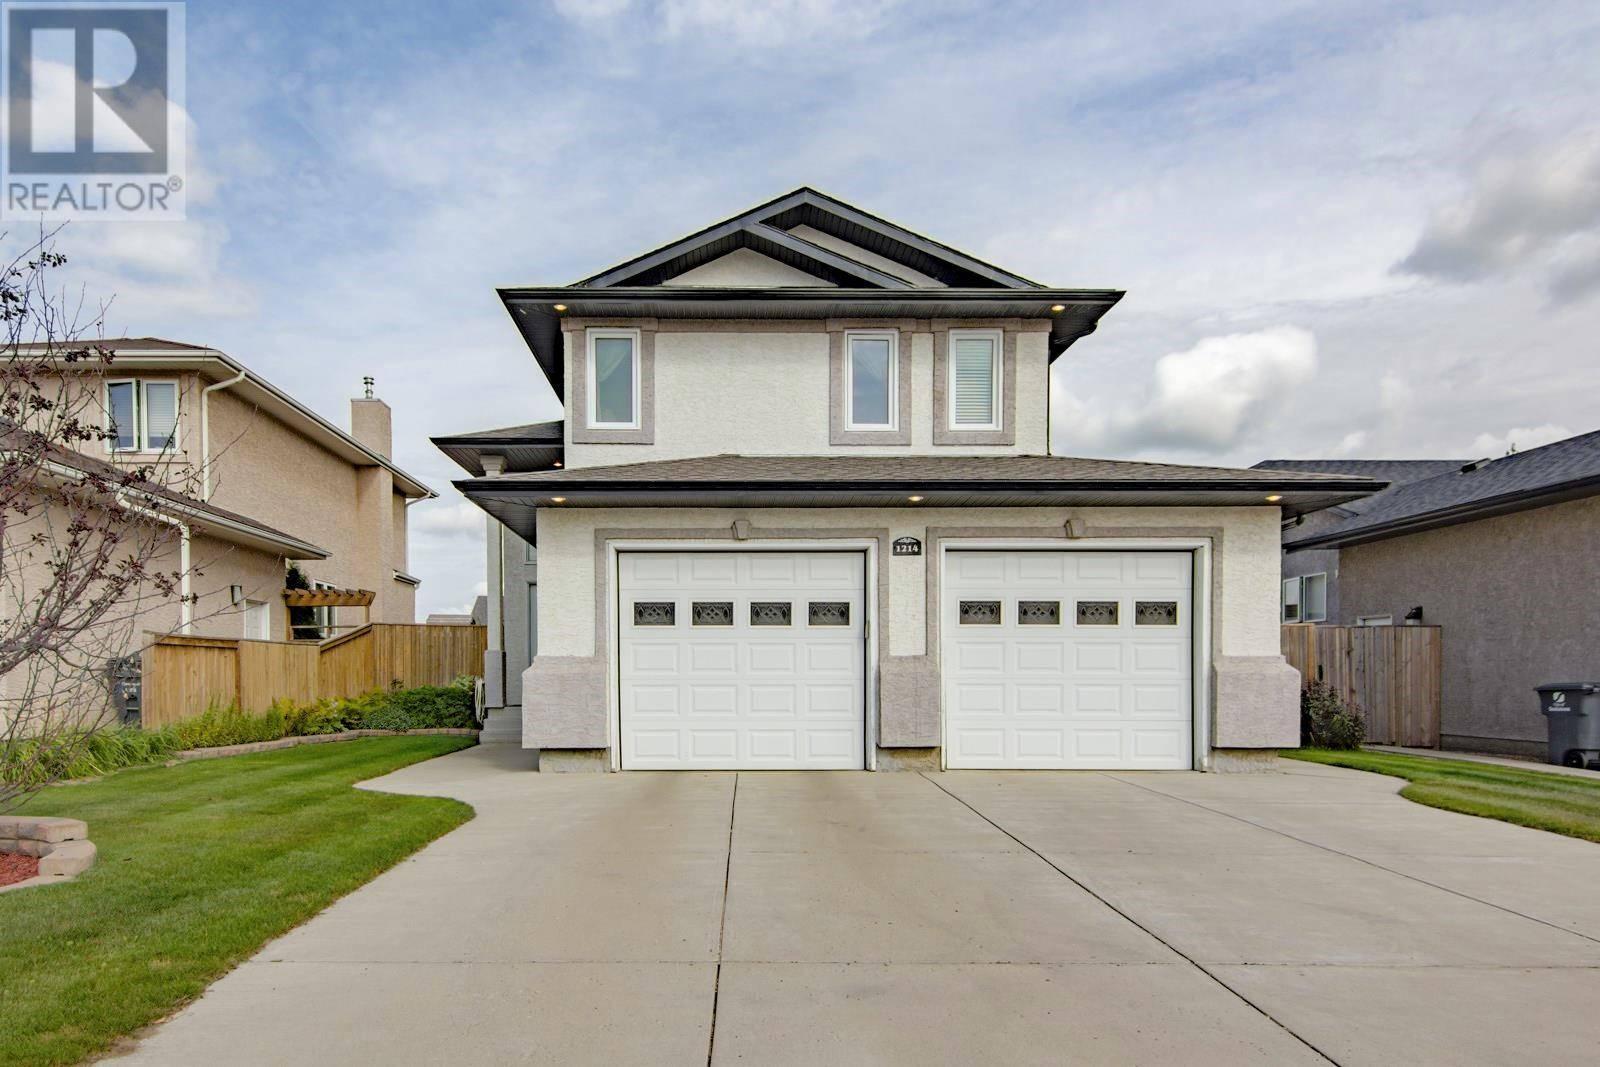 House for sale at 1214 Wright Cres Saskatoon Saskatchewan - MLS: SK783517